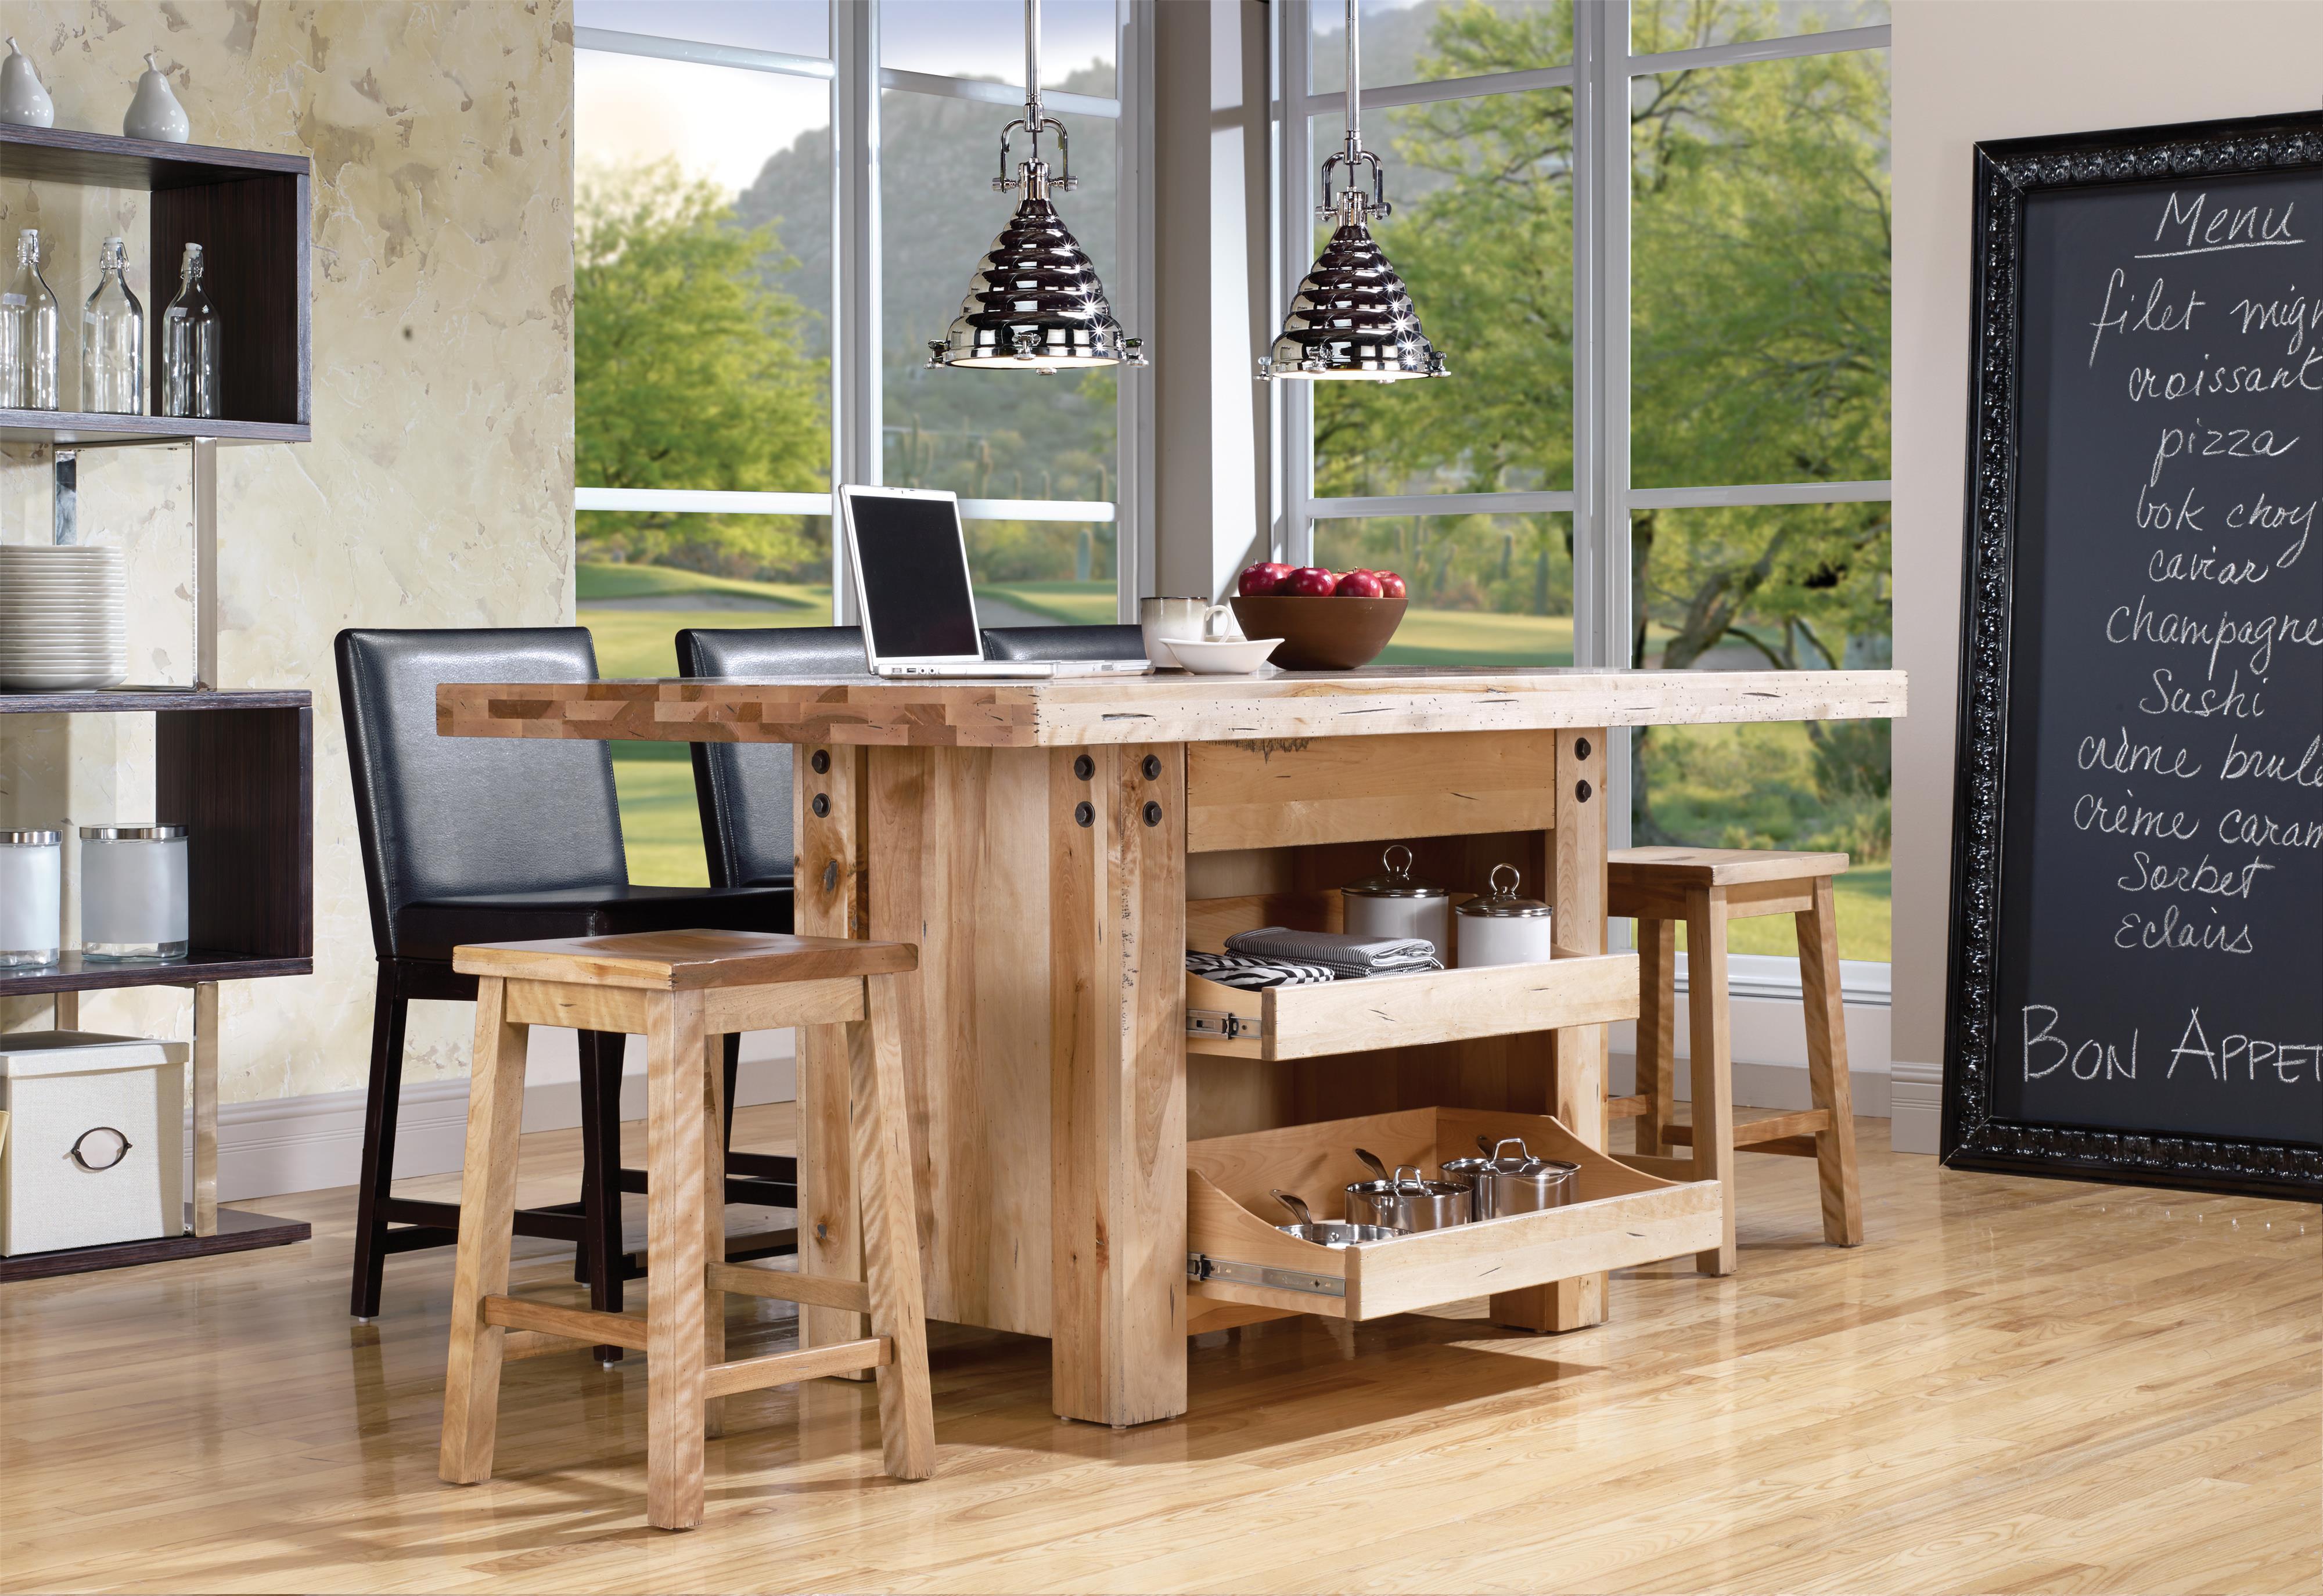 Canadel loft custom dining customizable island table - Table salle a manger originale ...